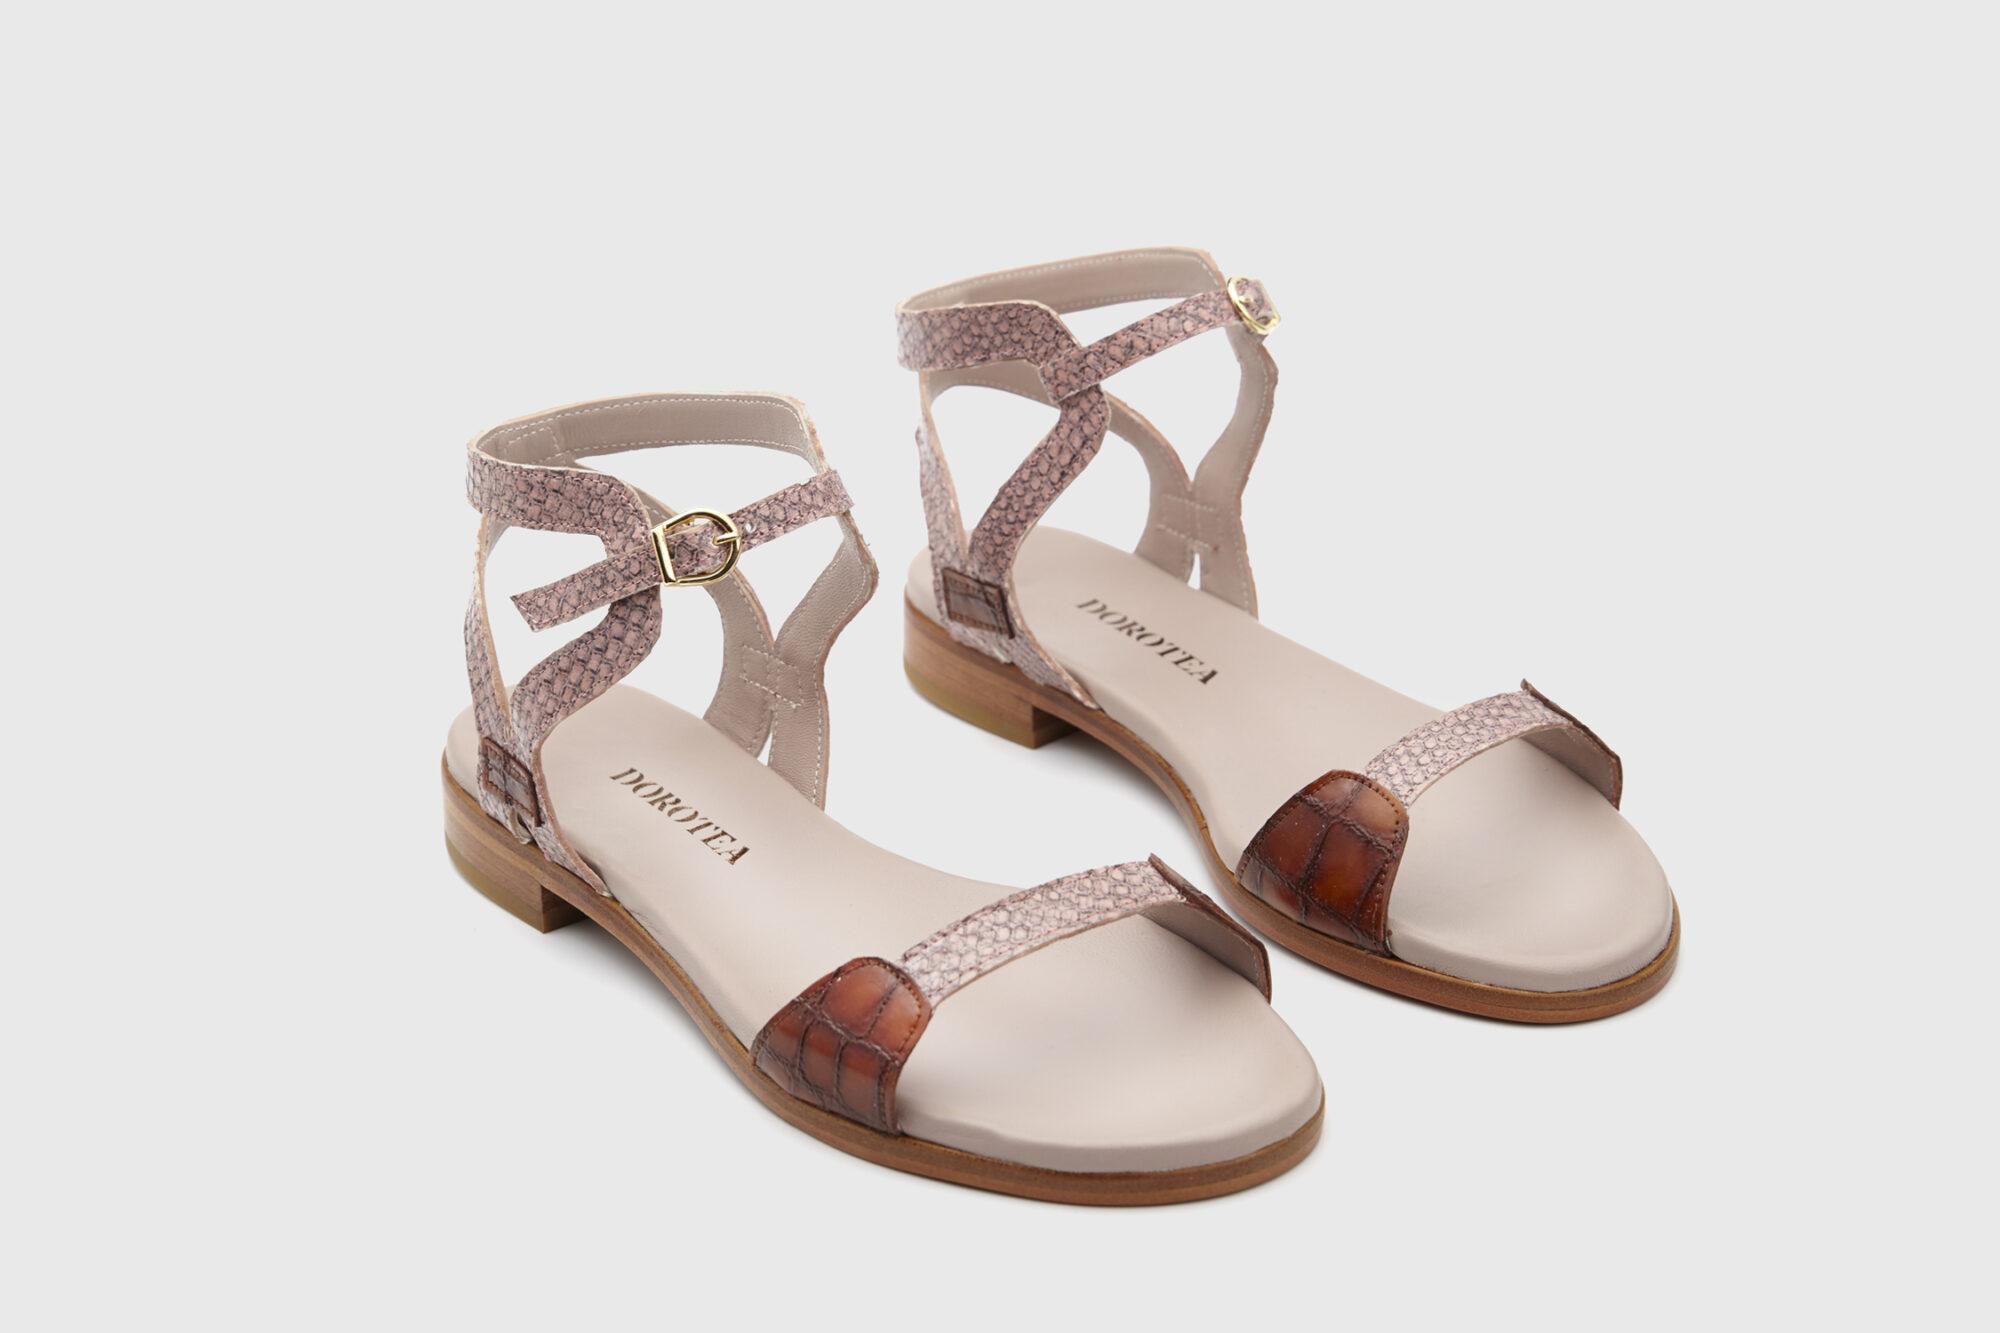 Dorotea sandalia plana Maya rosa ss18 par